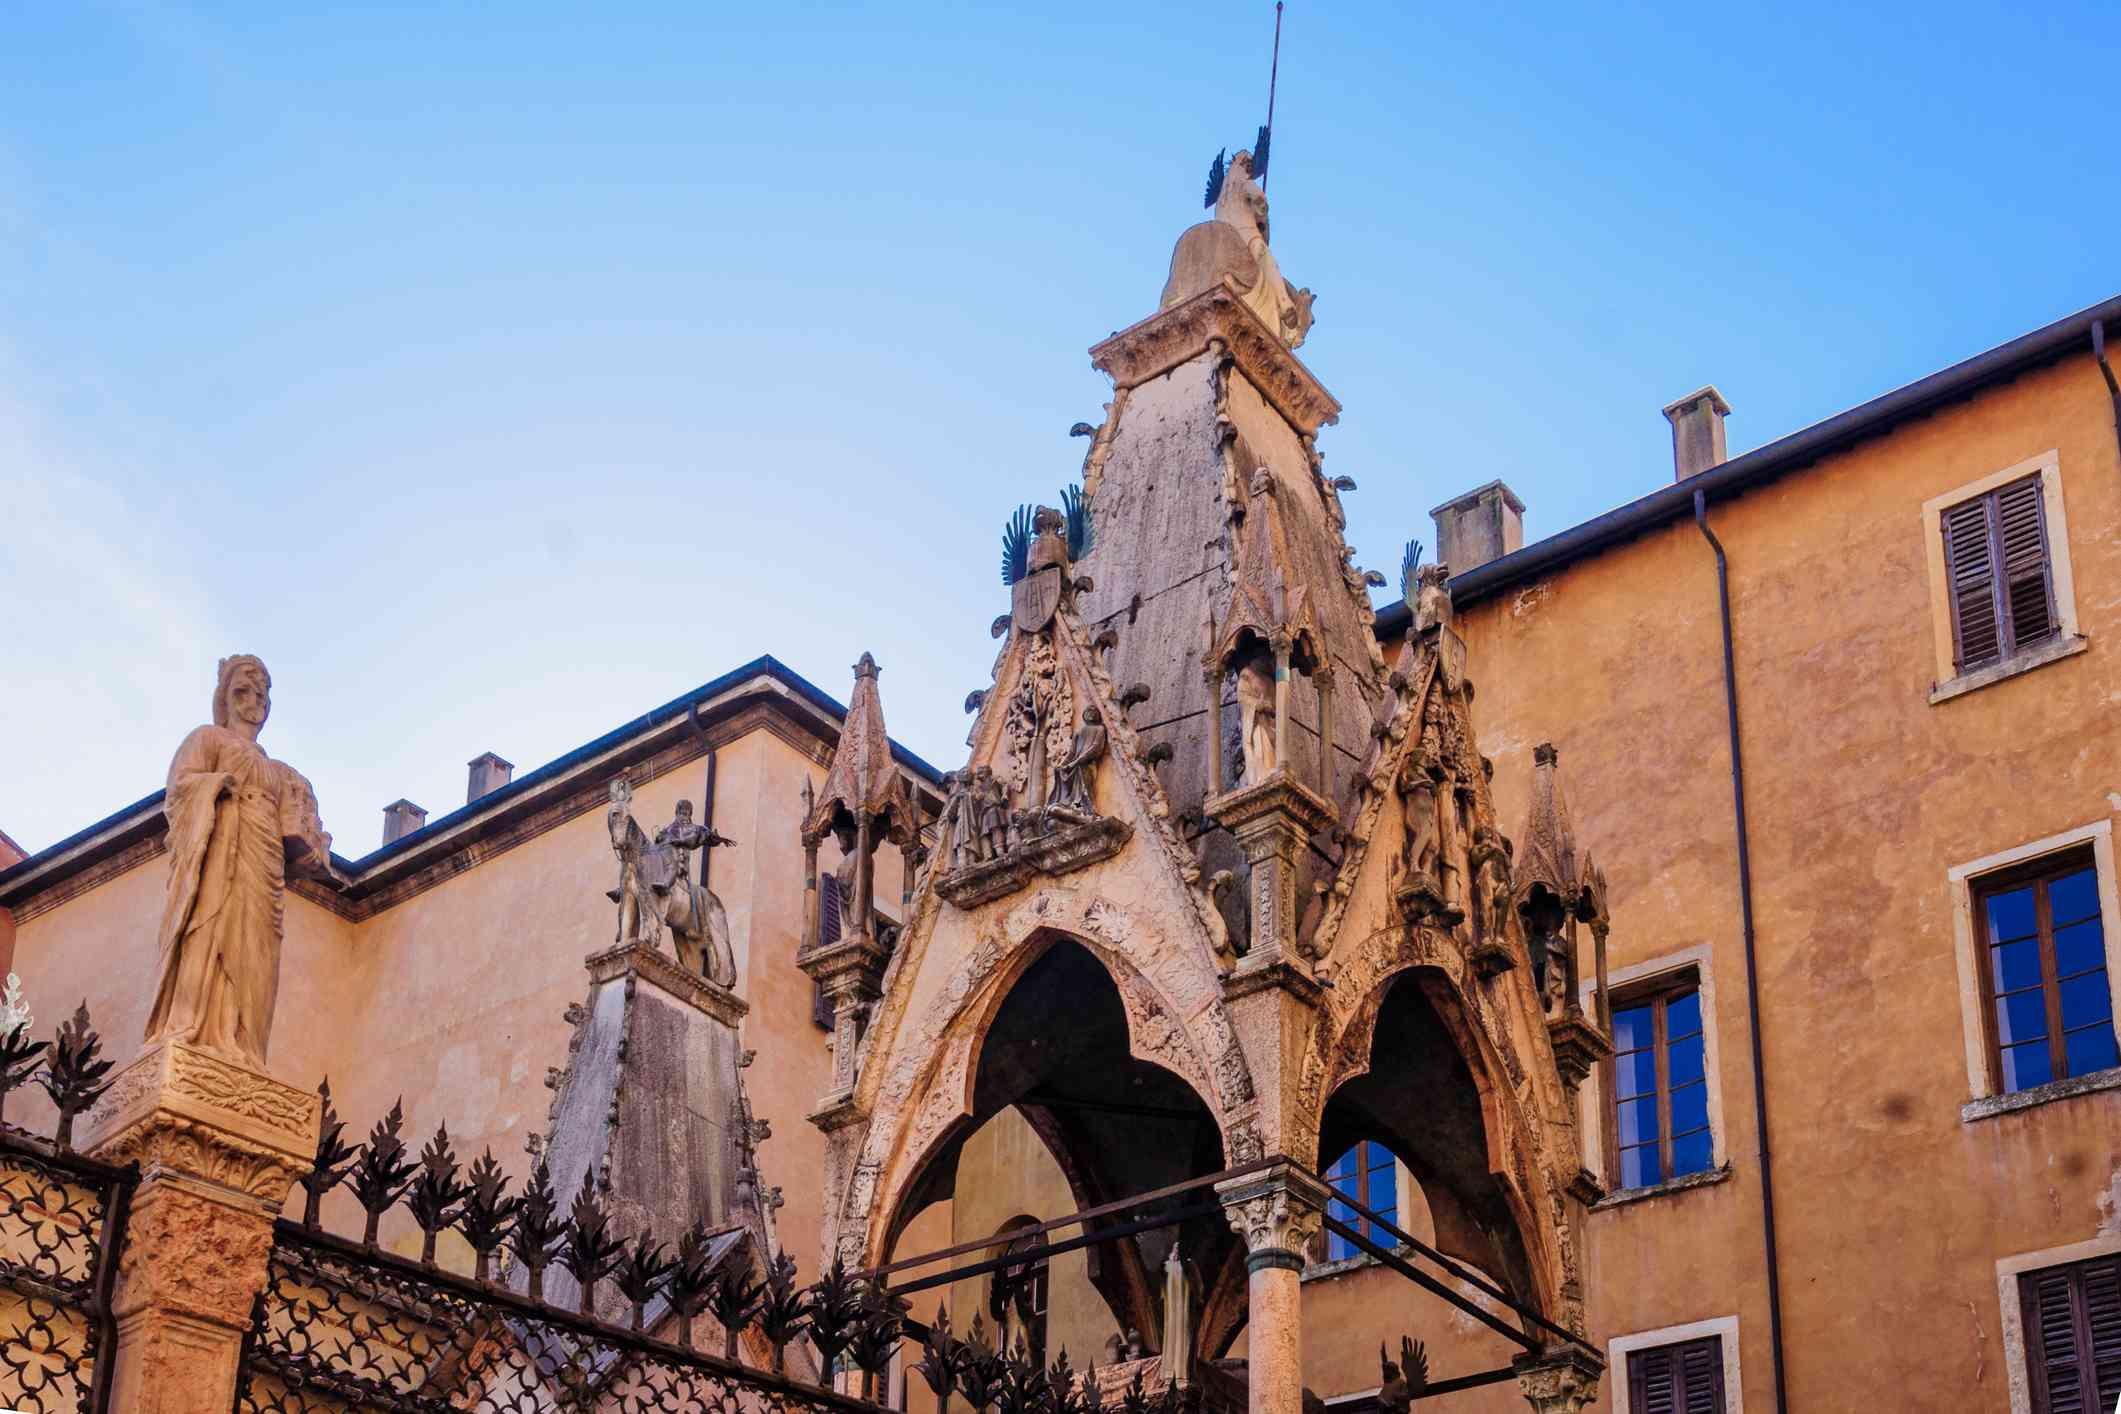 The Scaliger Tombs, Verona